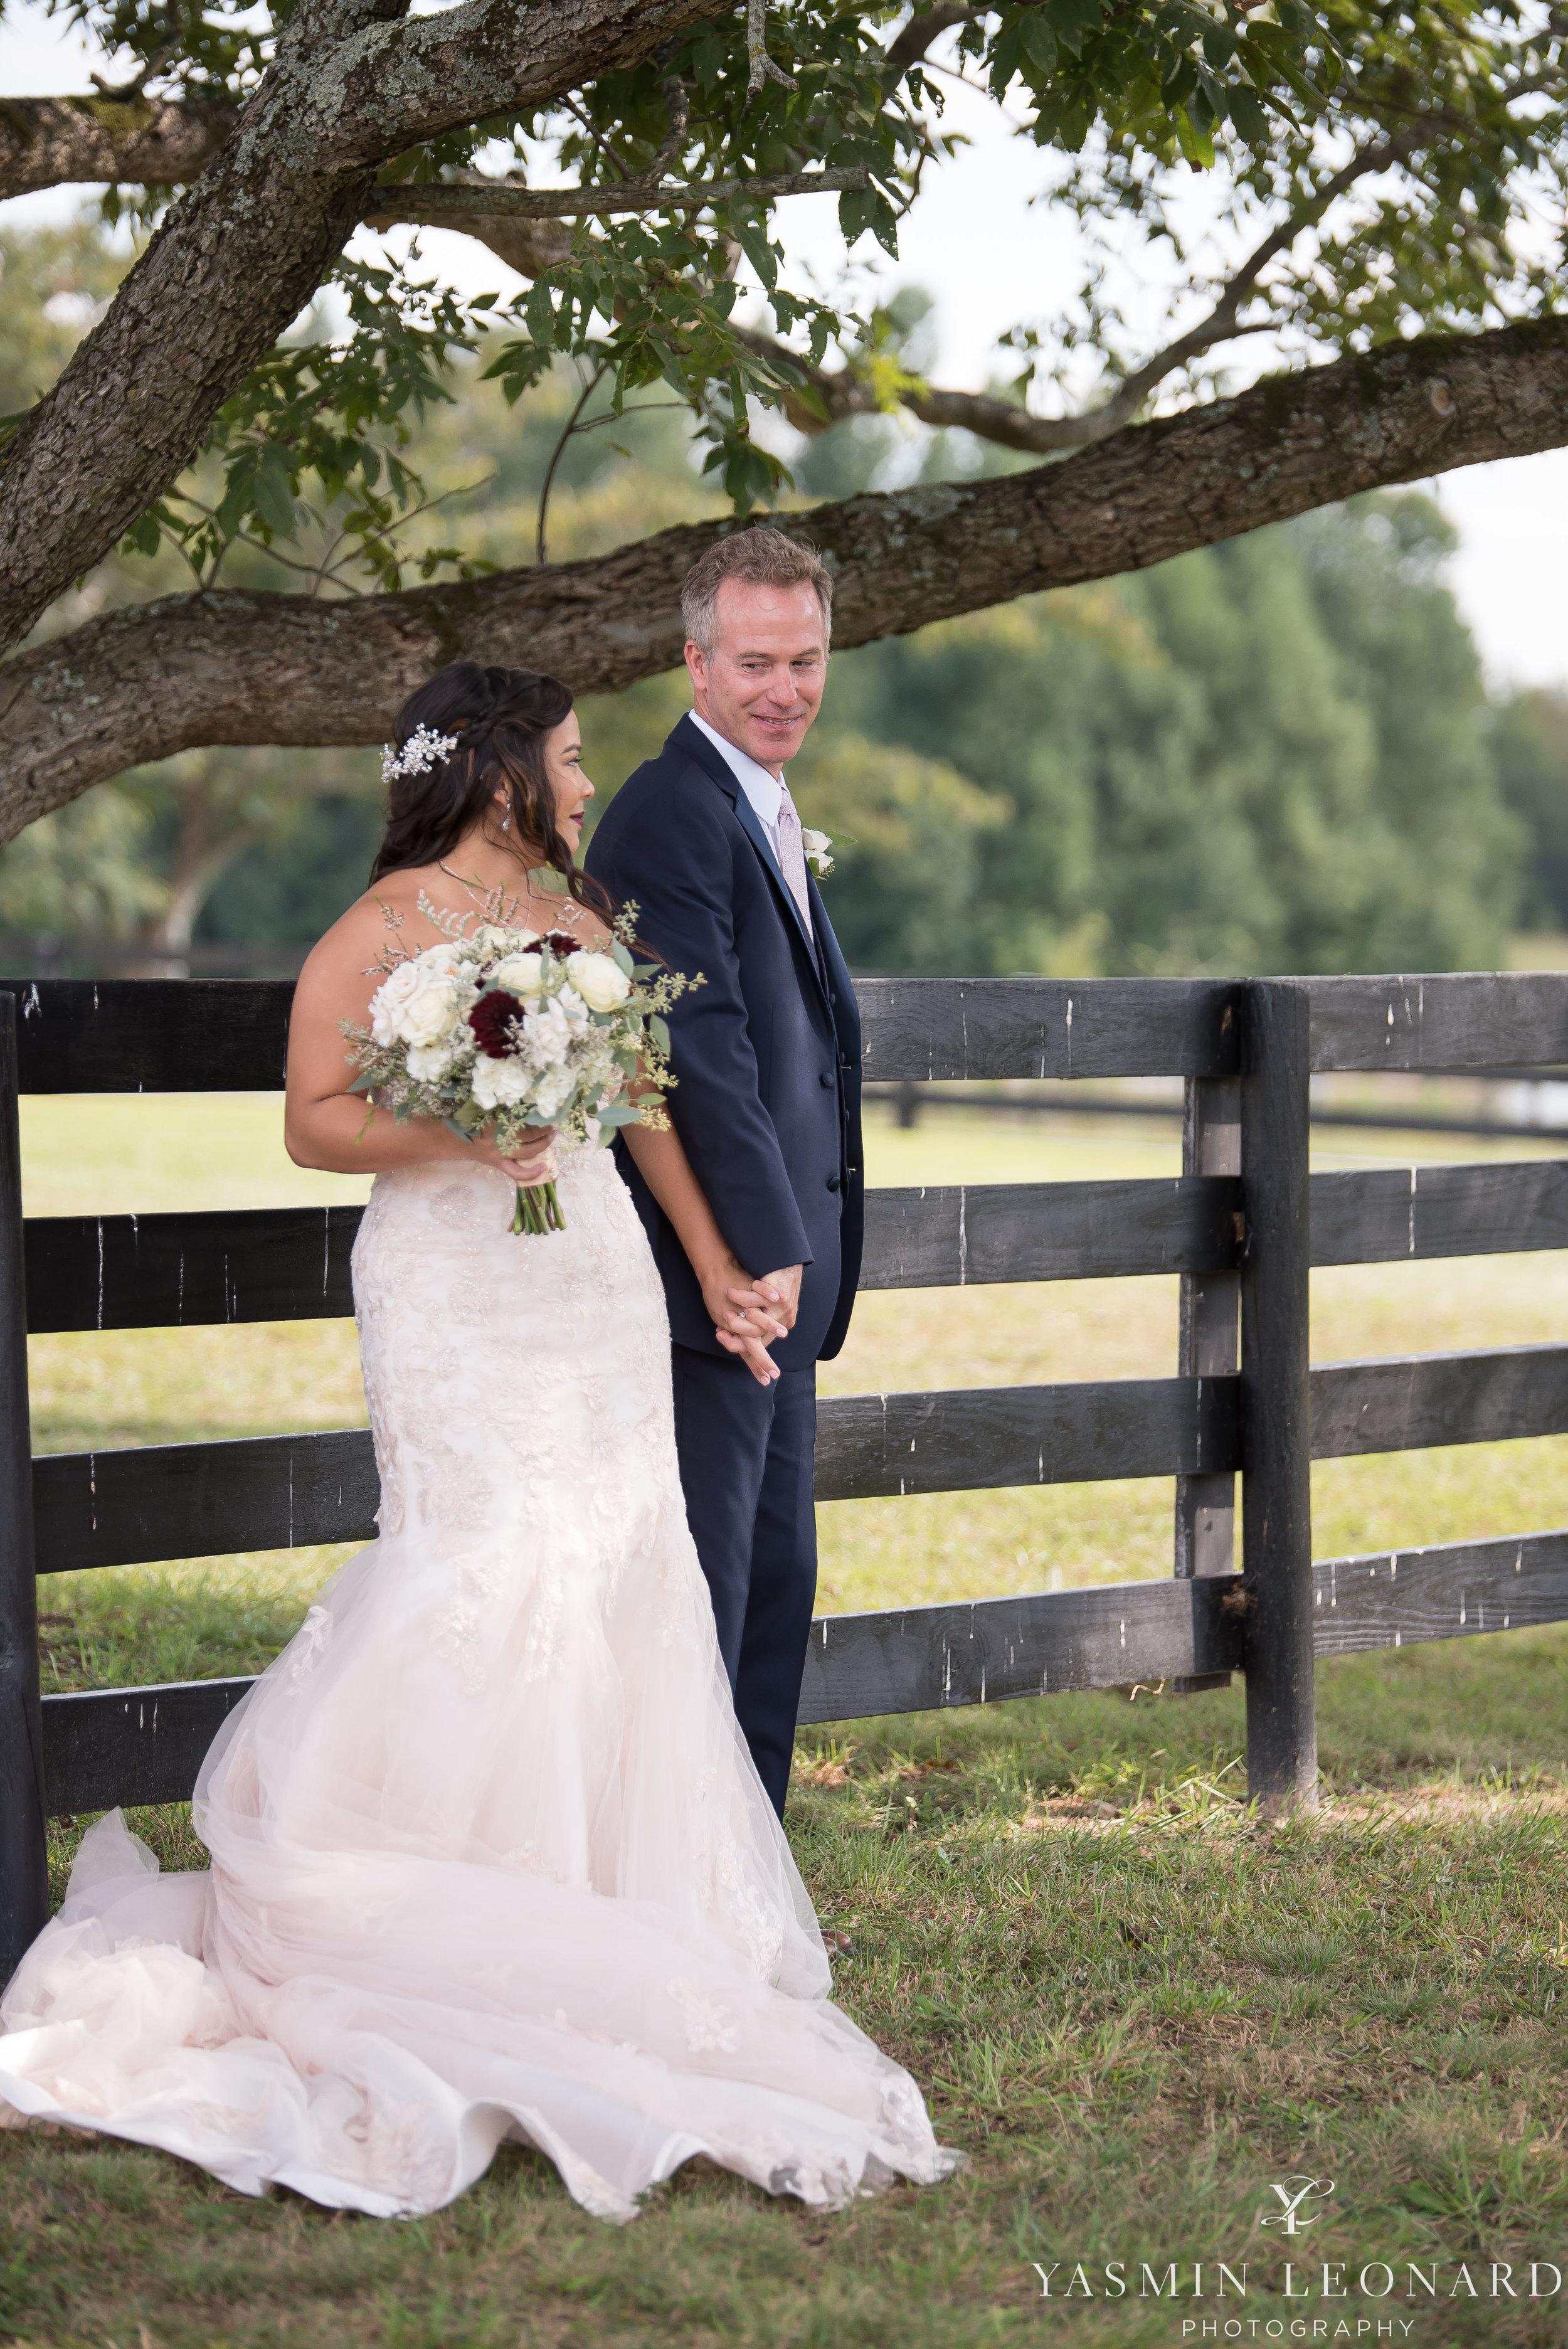 Mason Ridge   Liberty, NC   Aylissa and John   Yasmin Leonard Photography-35.jpg